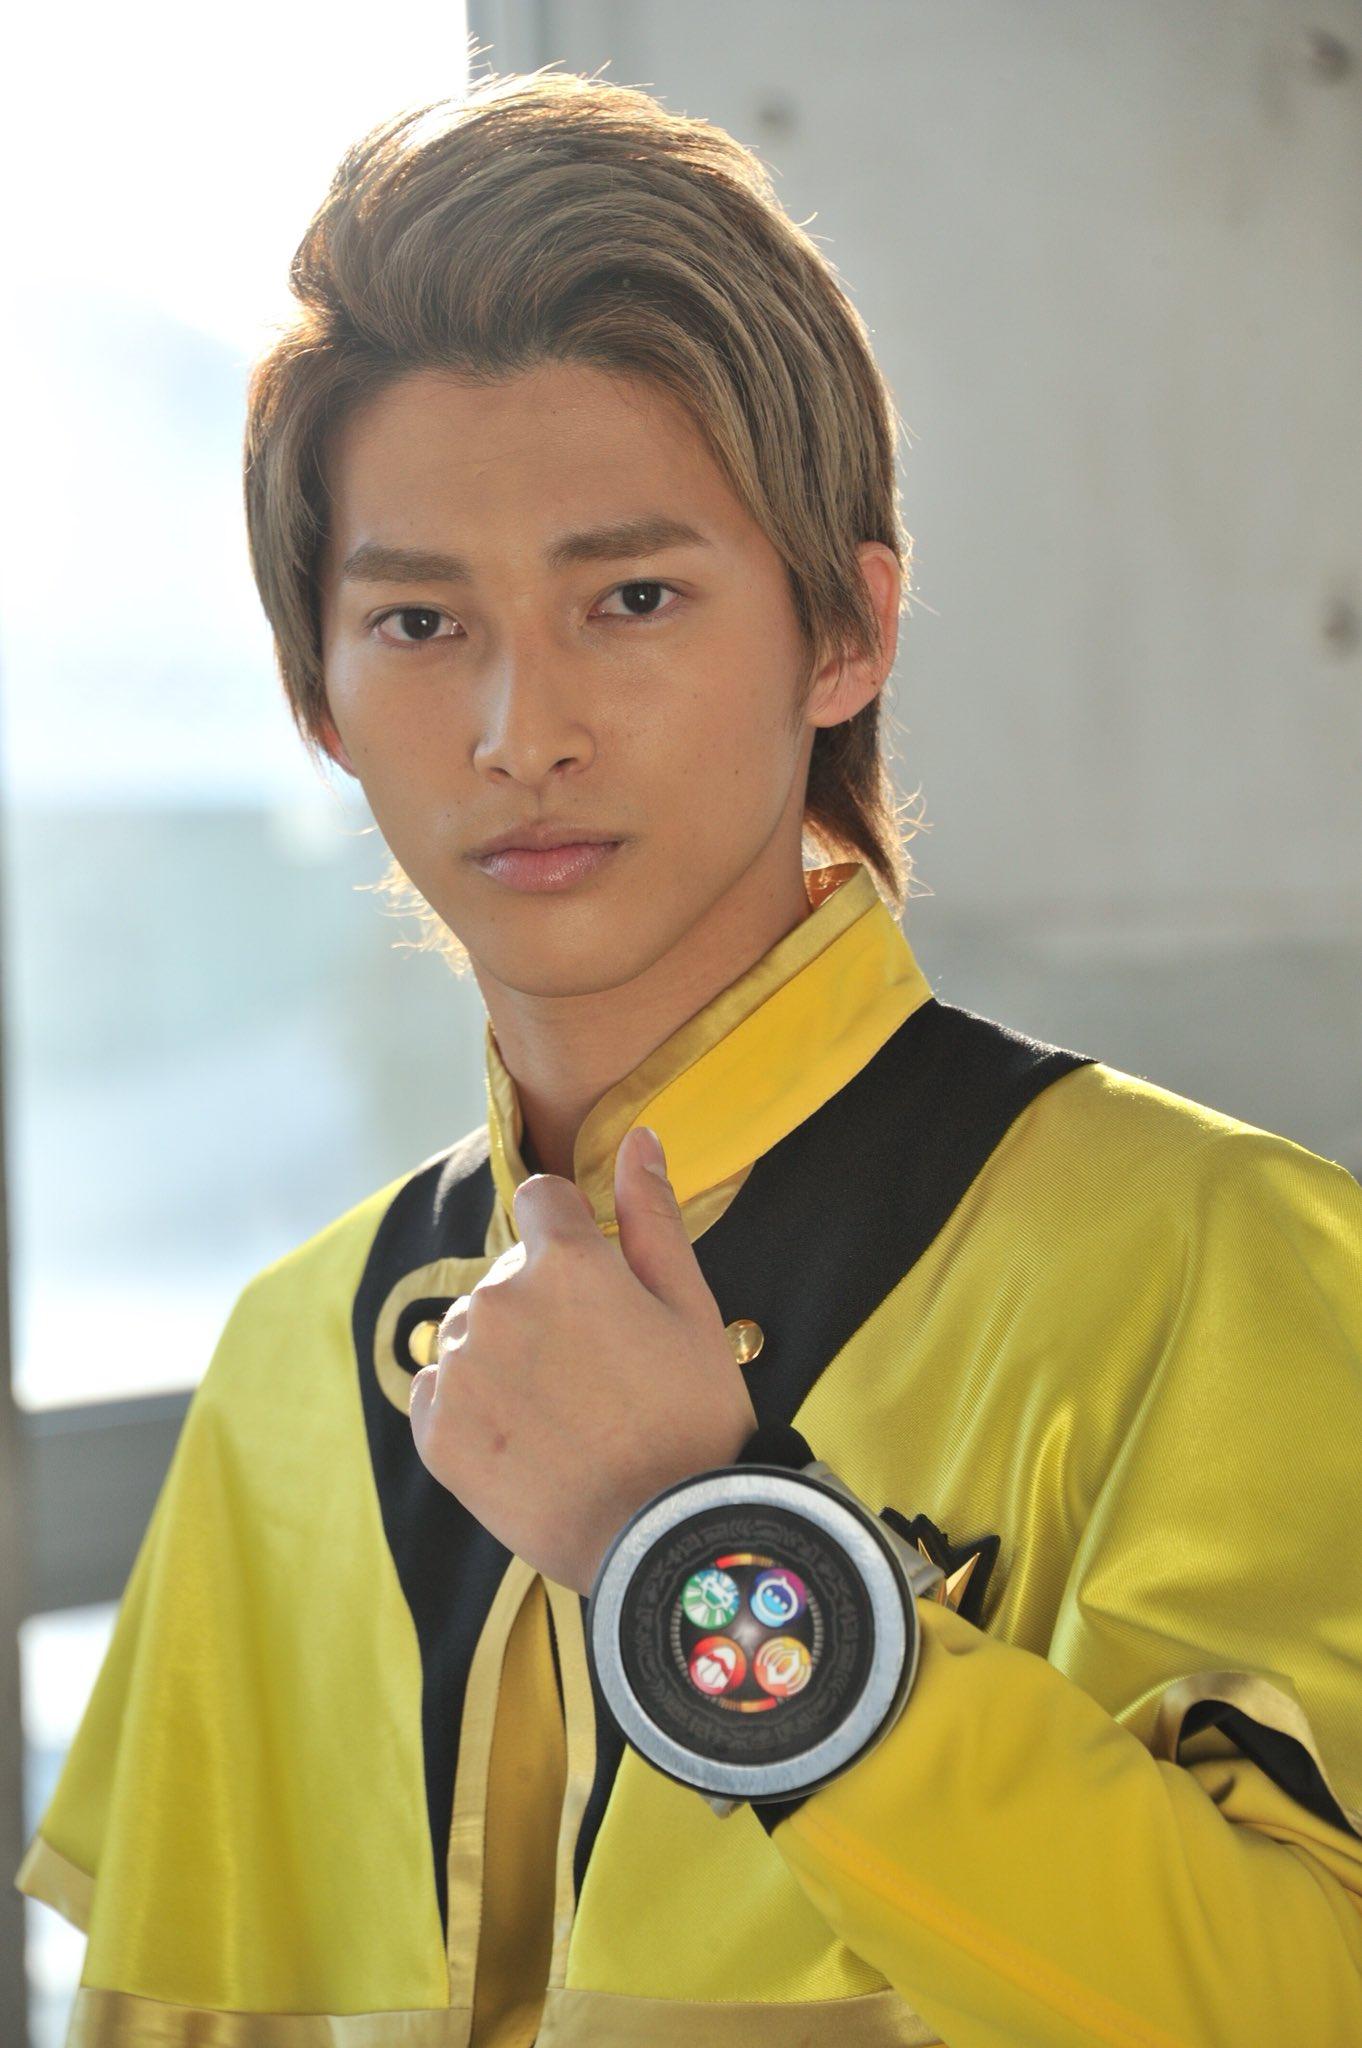 Mashin-Sentai-Kiramager-Scan-6.jpg